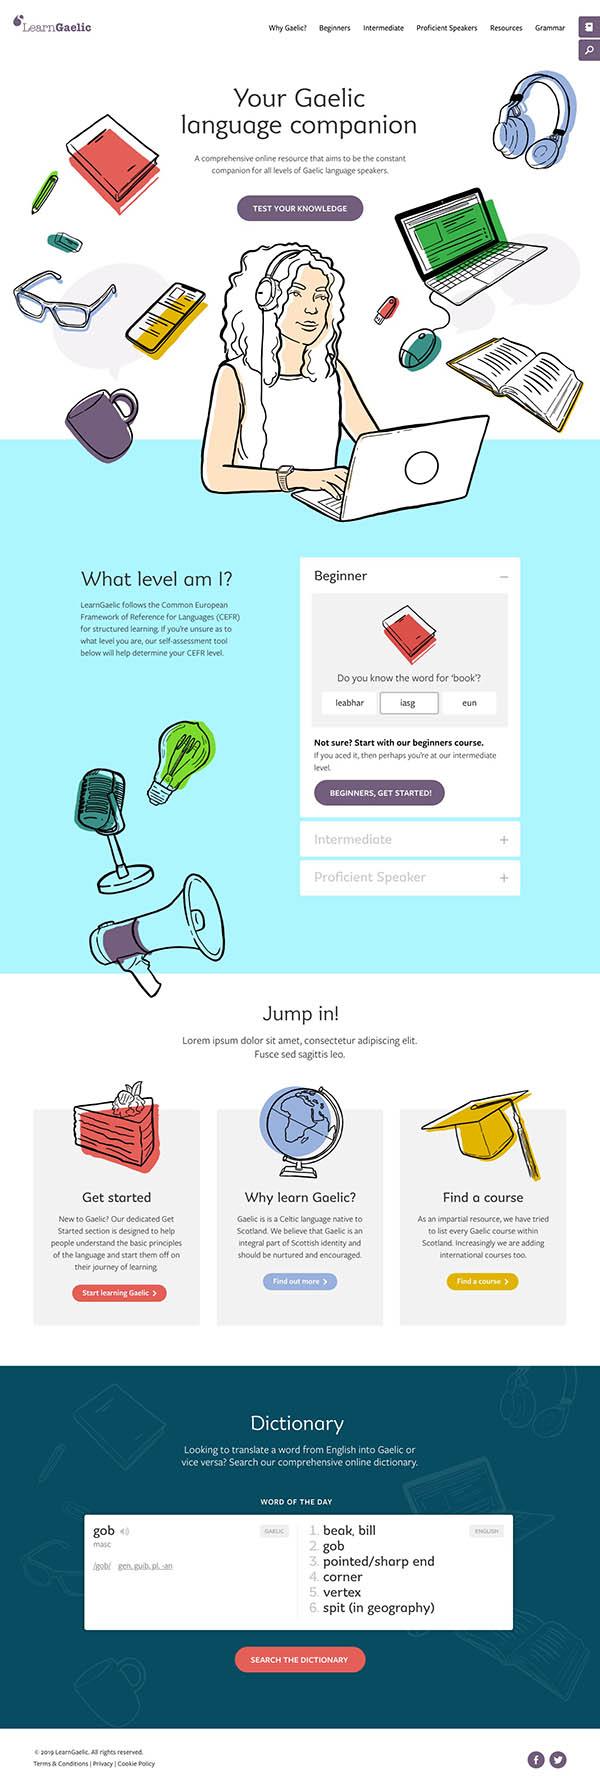 LearnGaelic homepage